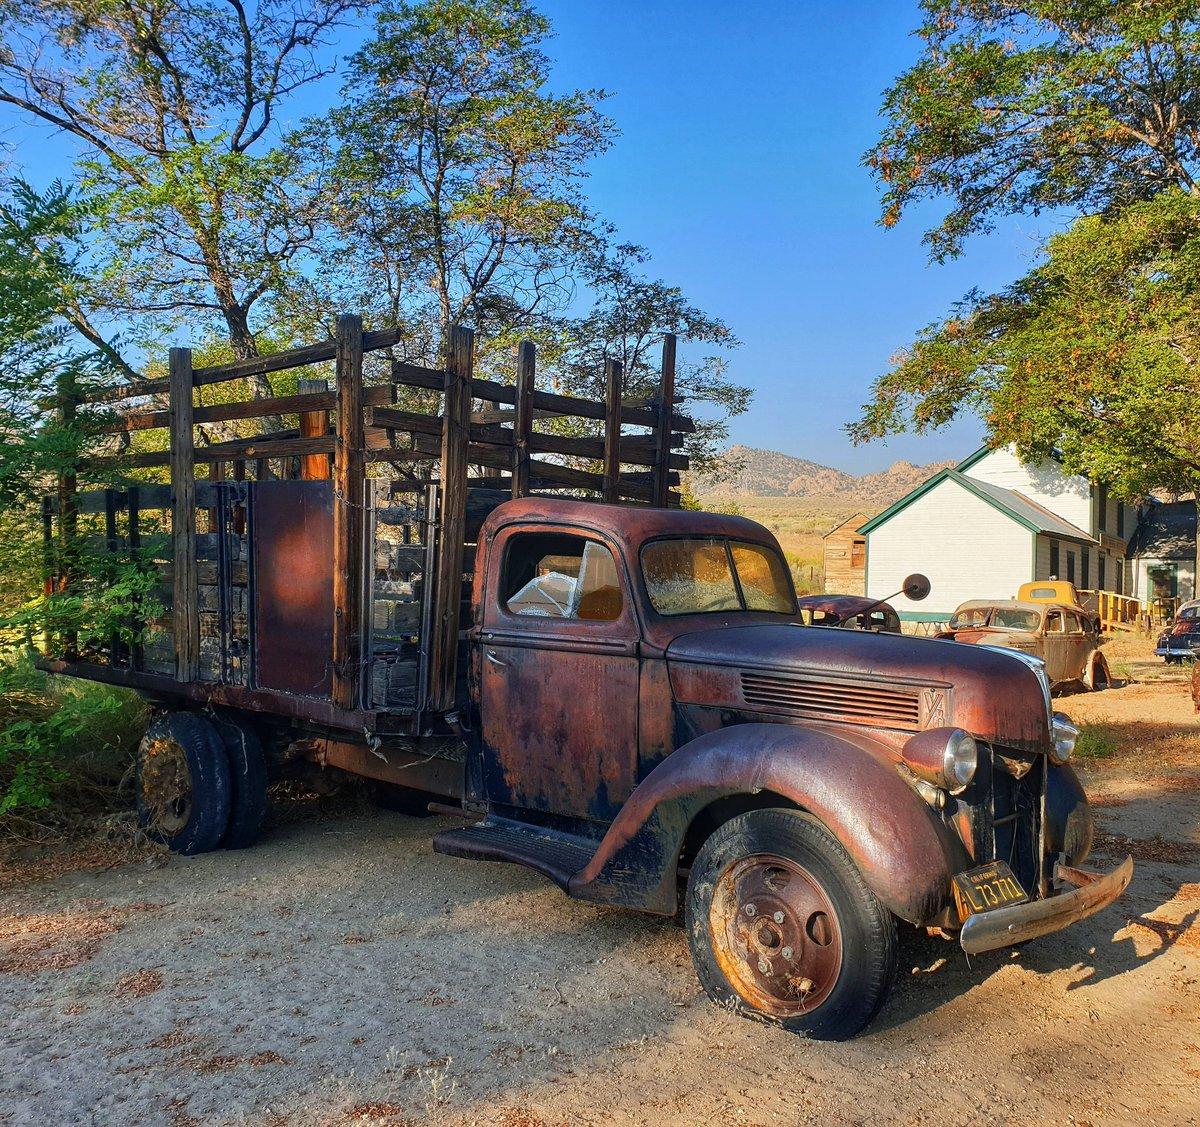 Old truck #benton #Nevada #usa #travel #morningbeautiful #endlessroaming